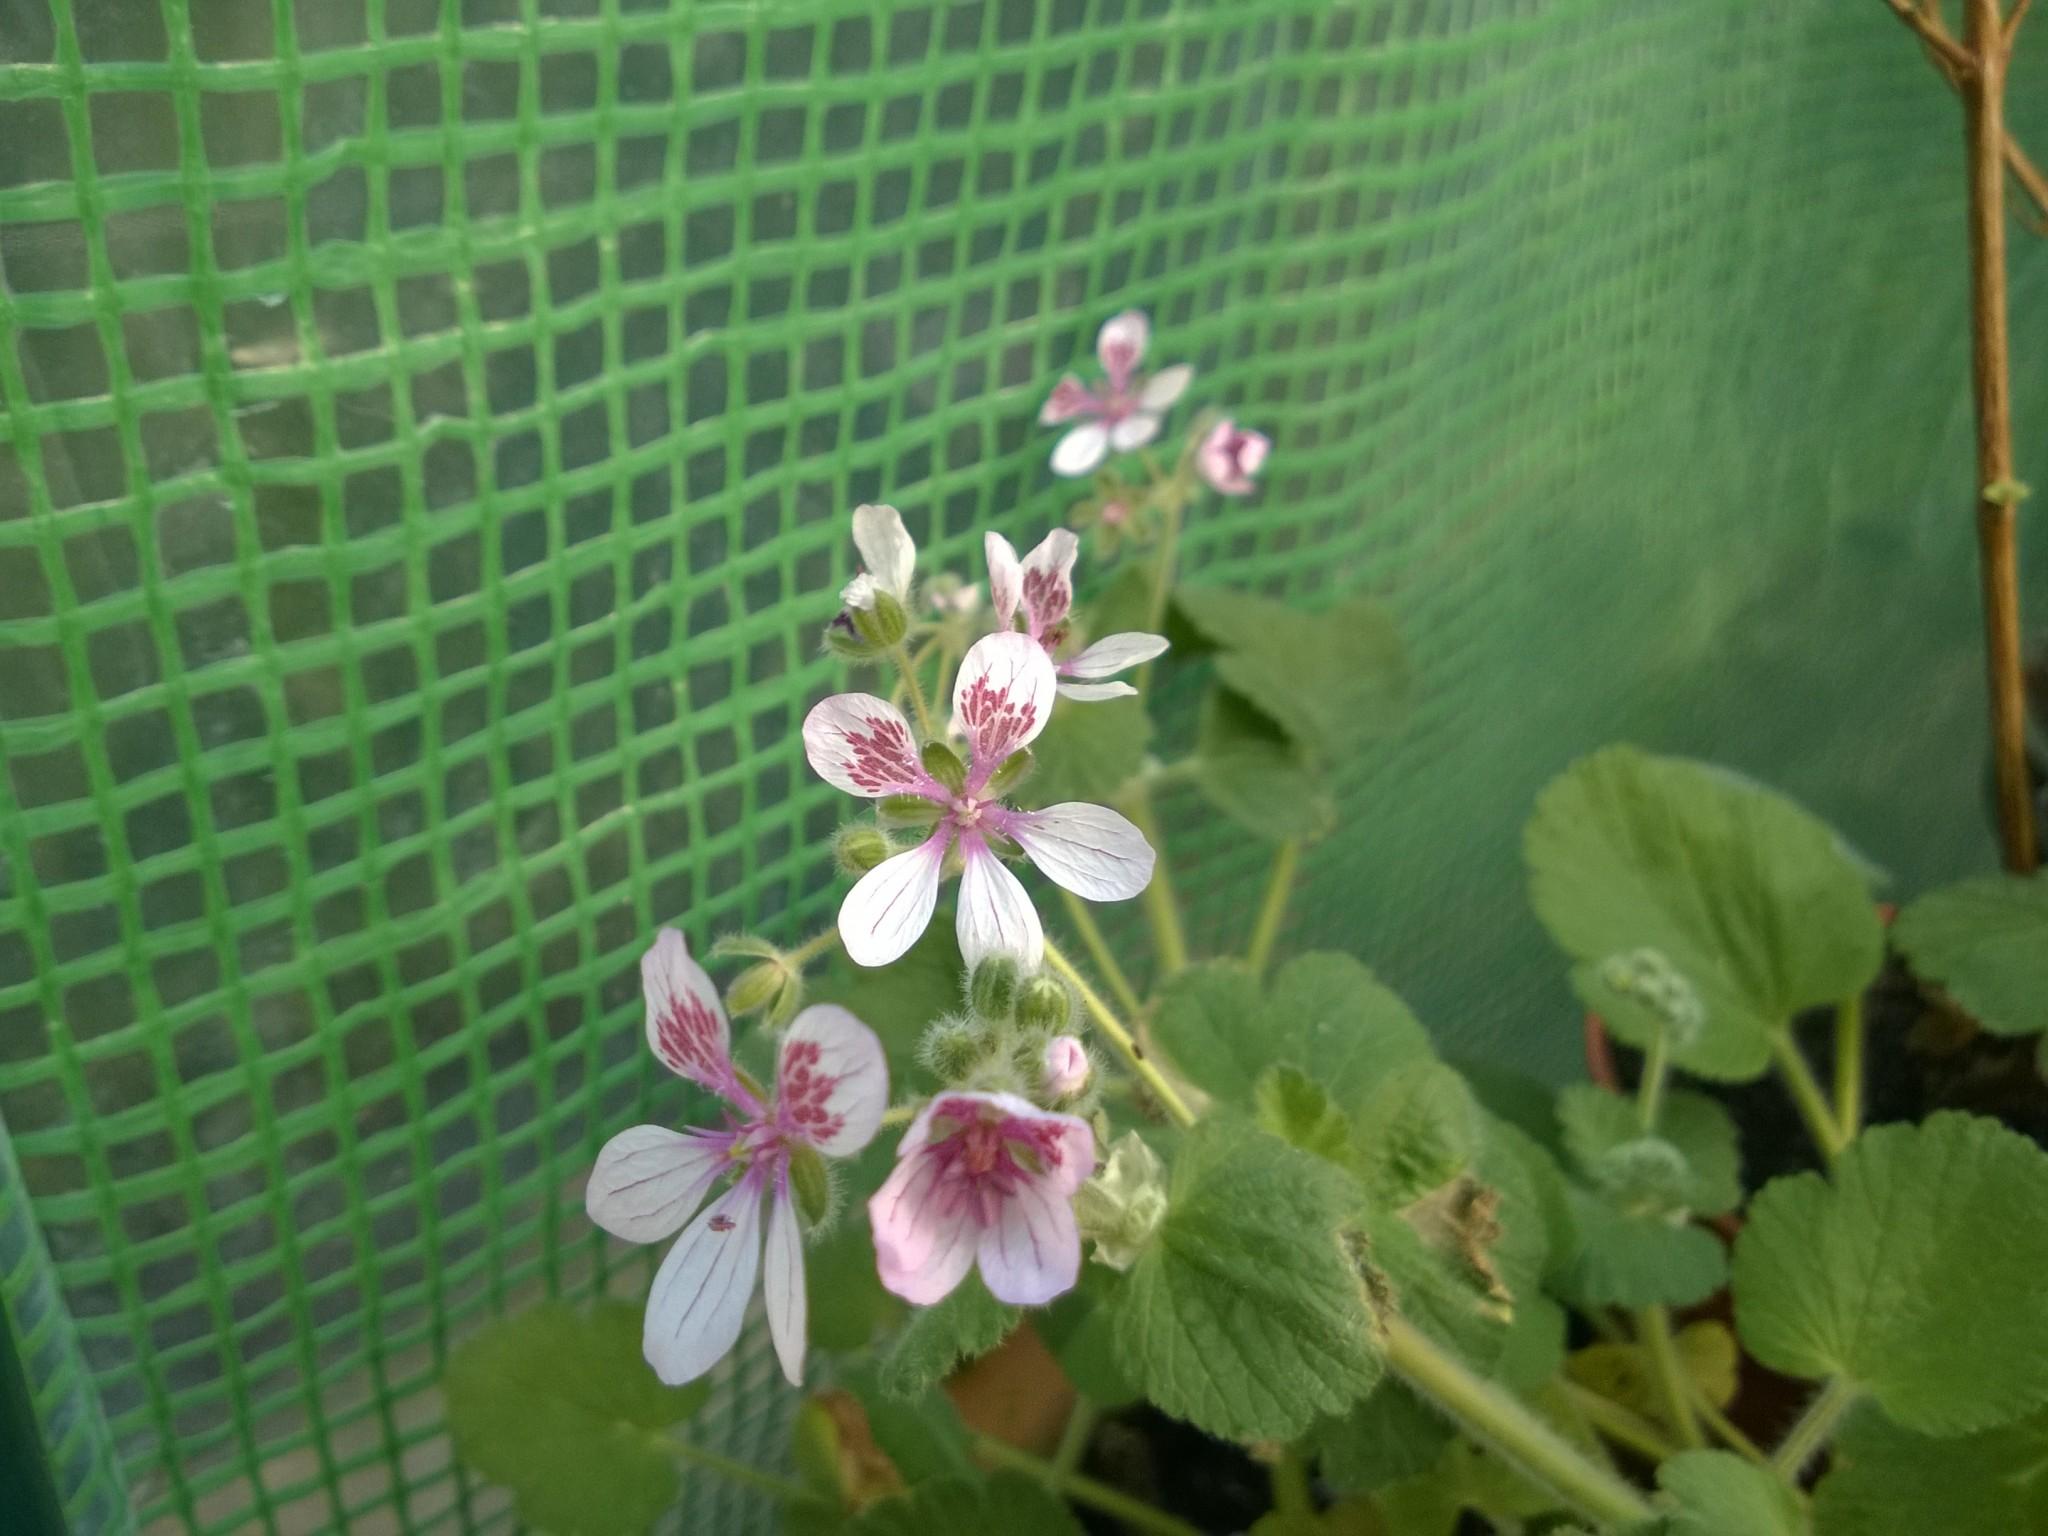 Europium Flowering in the Winter